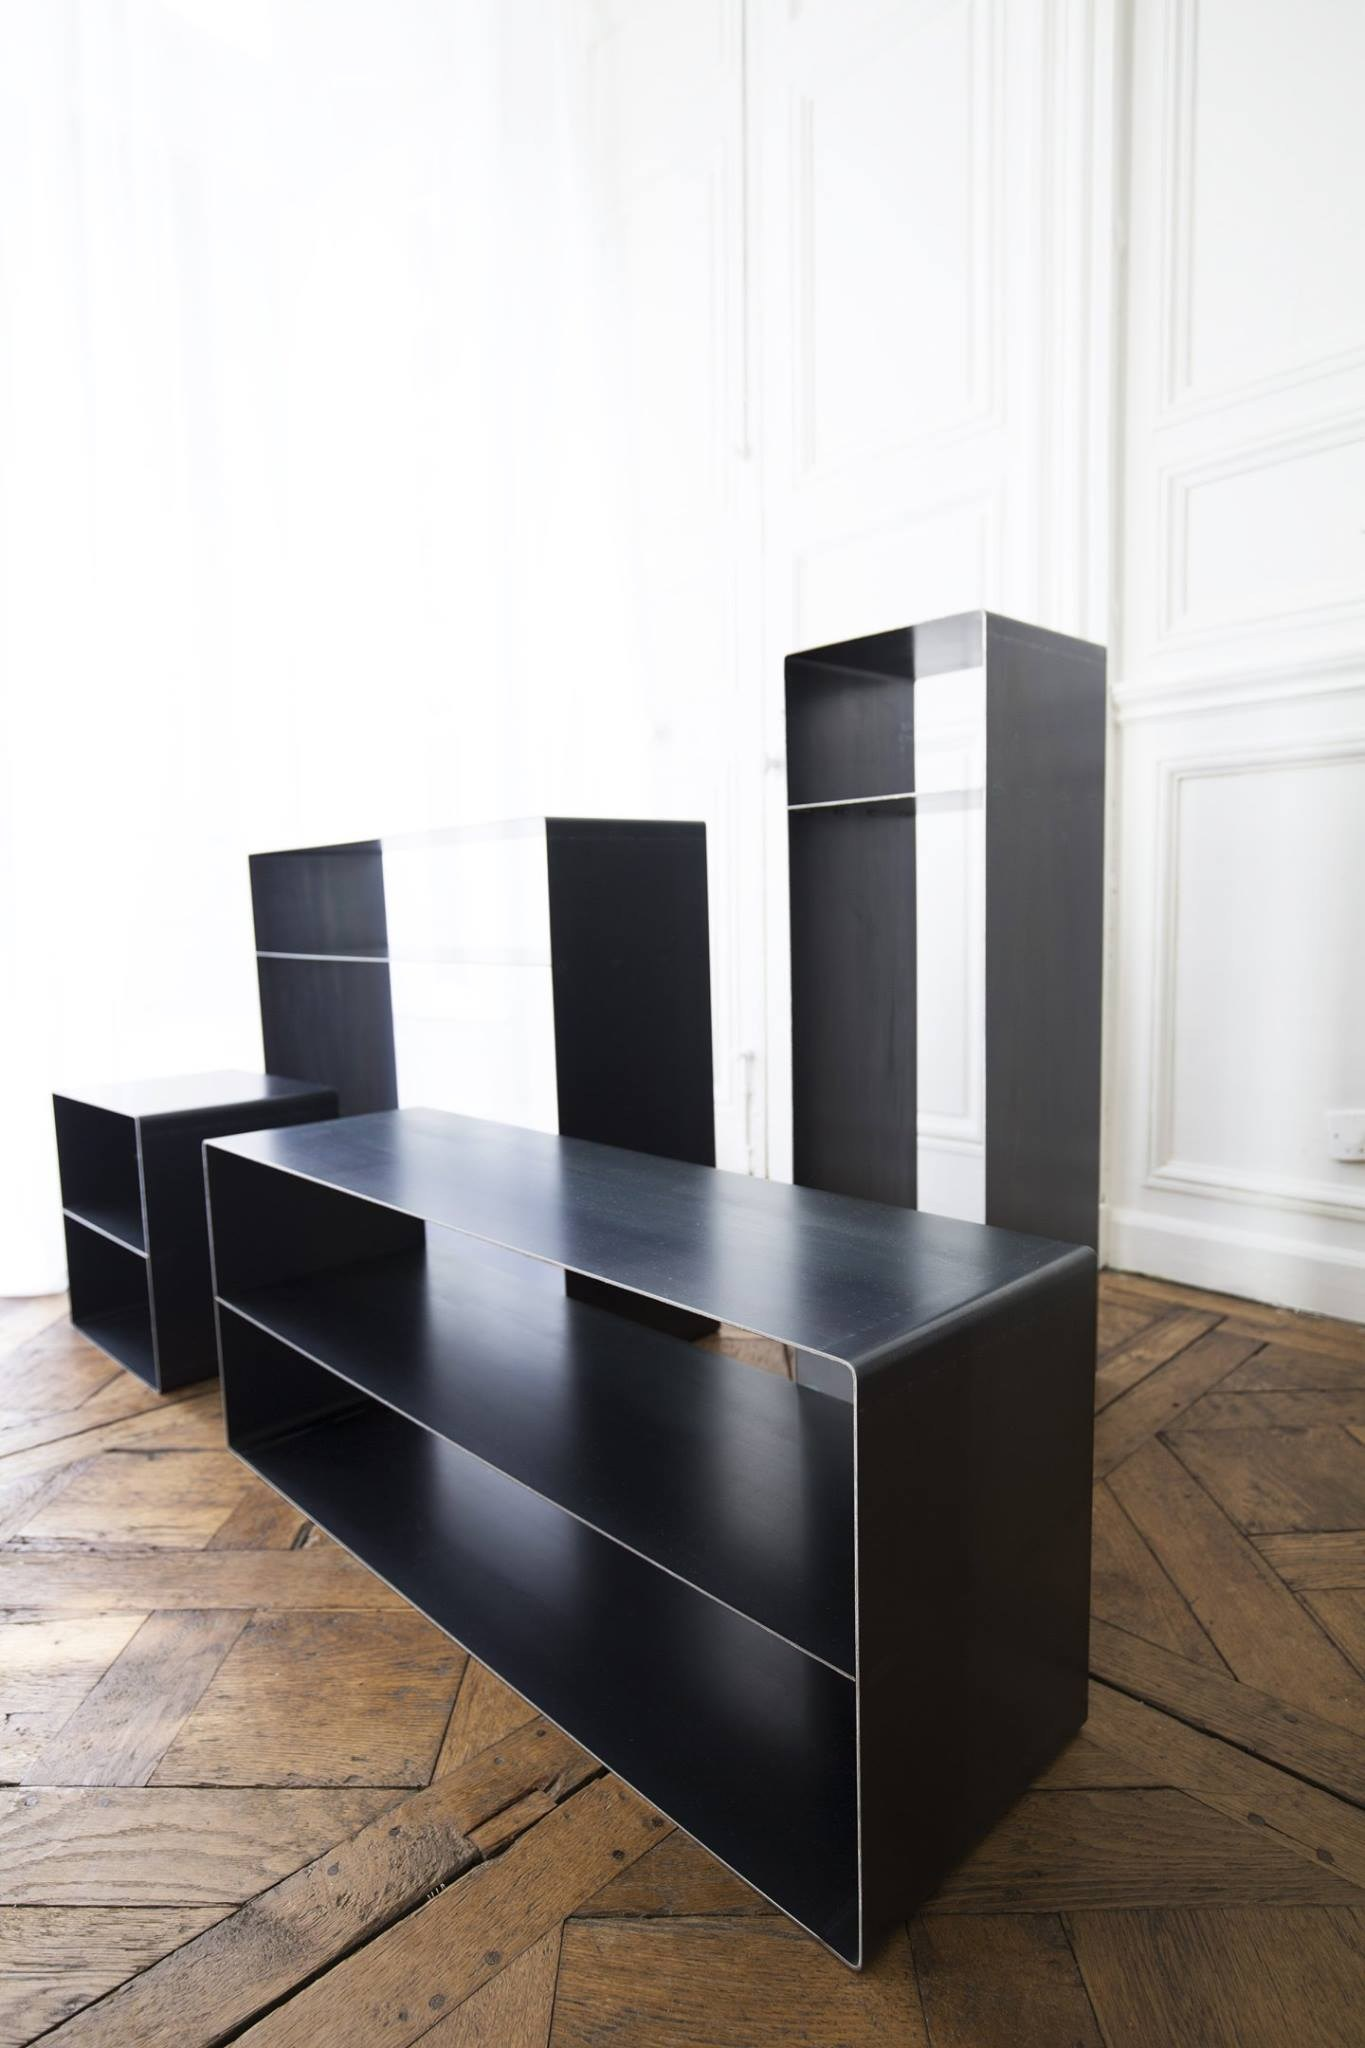 quattro meuble de rangement by vidame creation design julien vidame. Black Bedroom Furniture Sets. Home Design Ideas